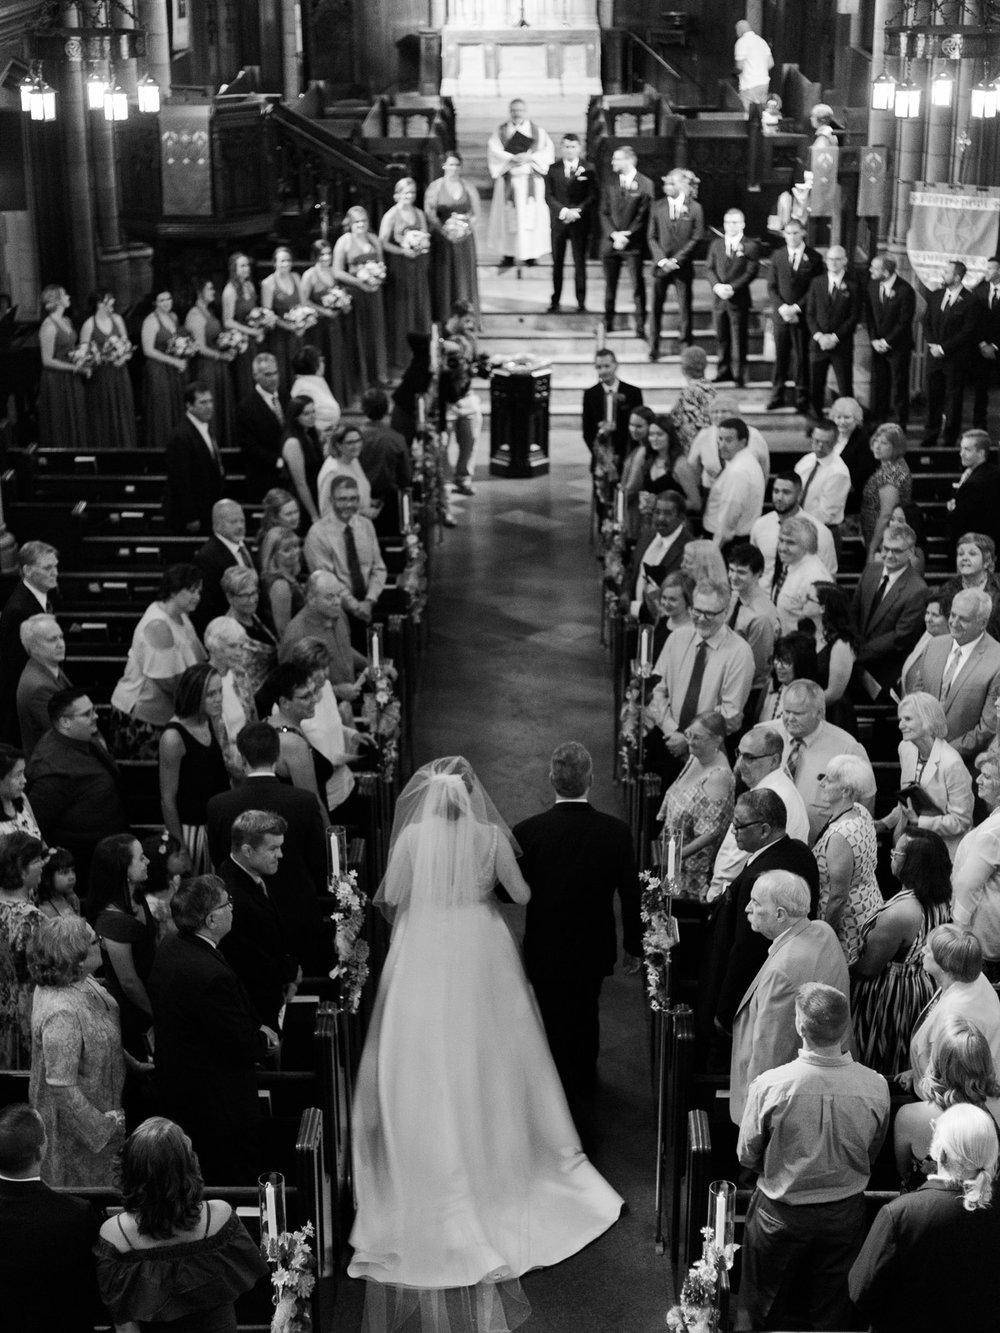 vibrant-tangier-akron-wedding-photos-by-matt-erickson-photography-8.jpg